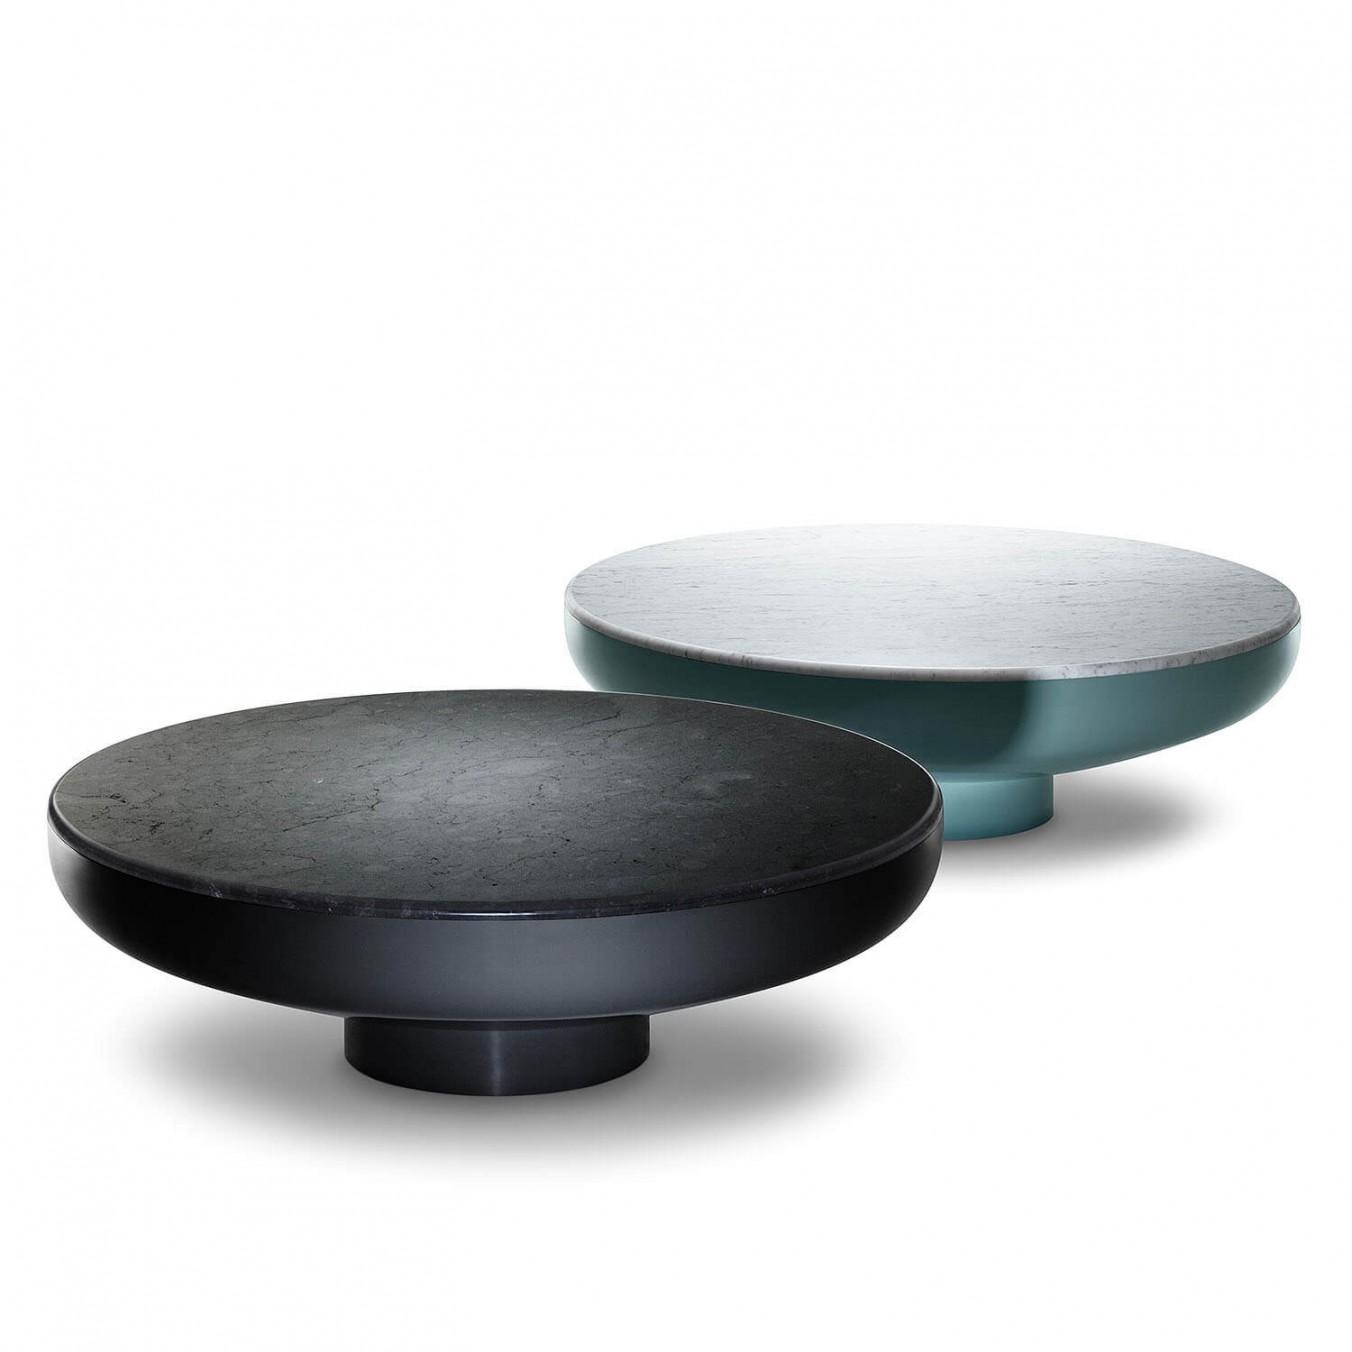 Tambor Table